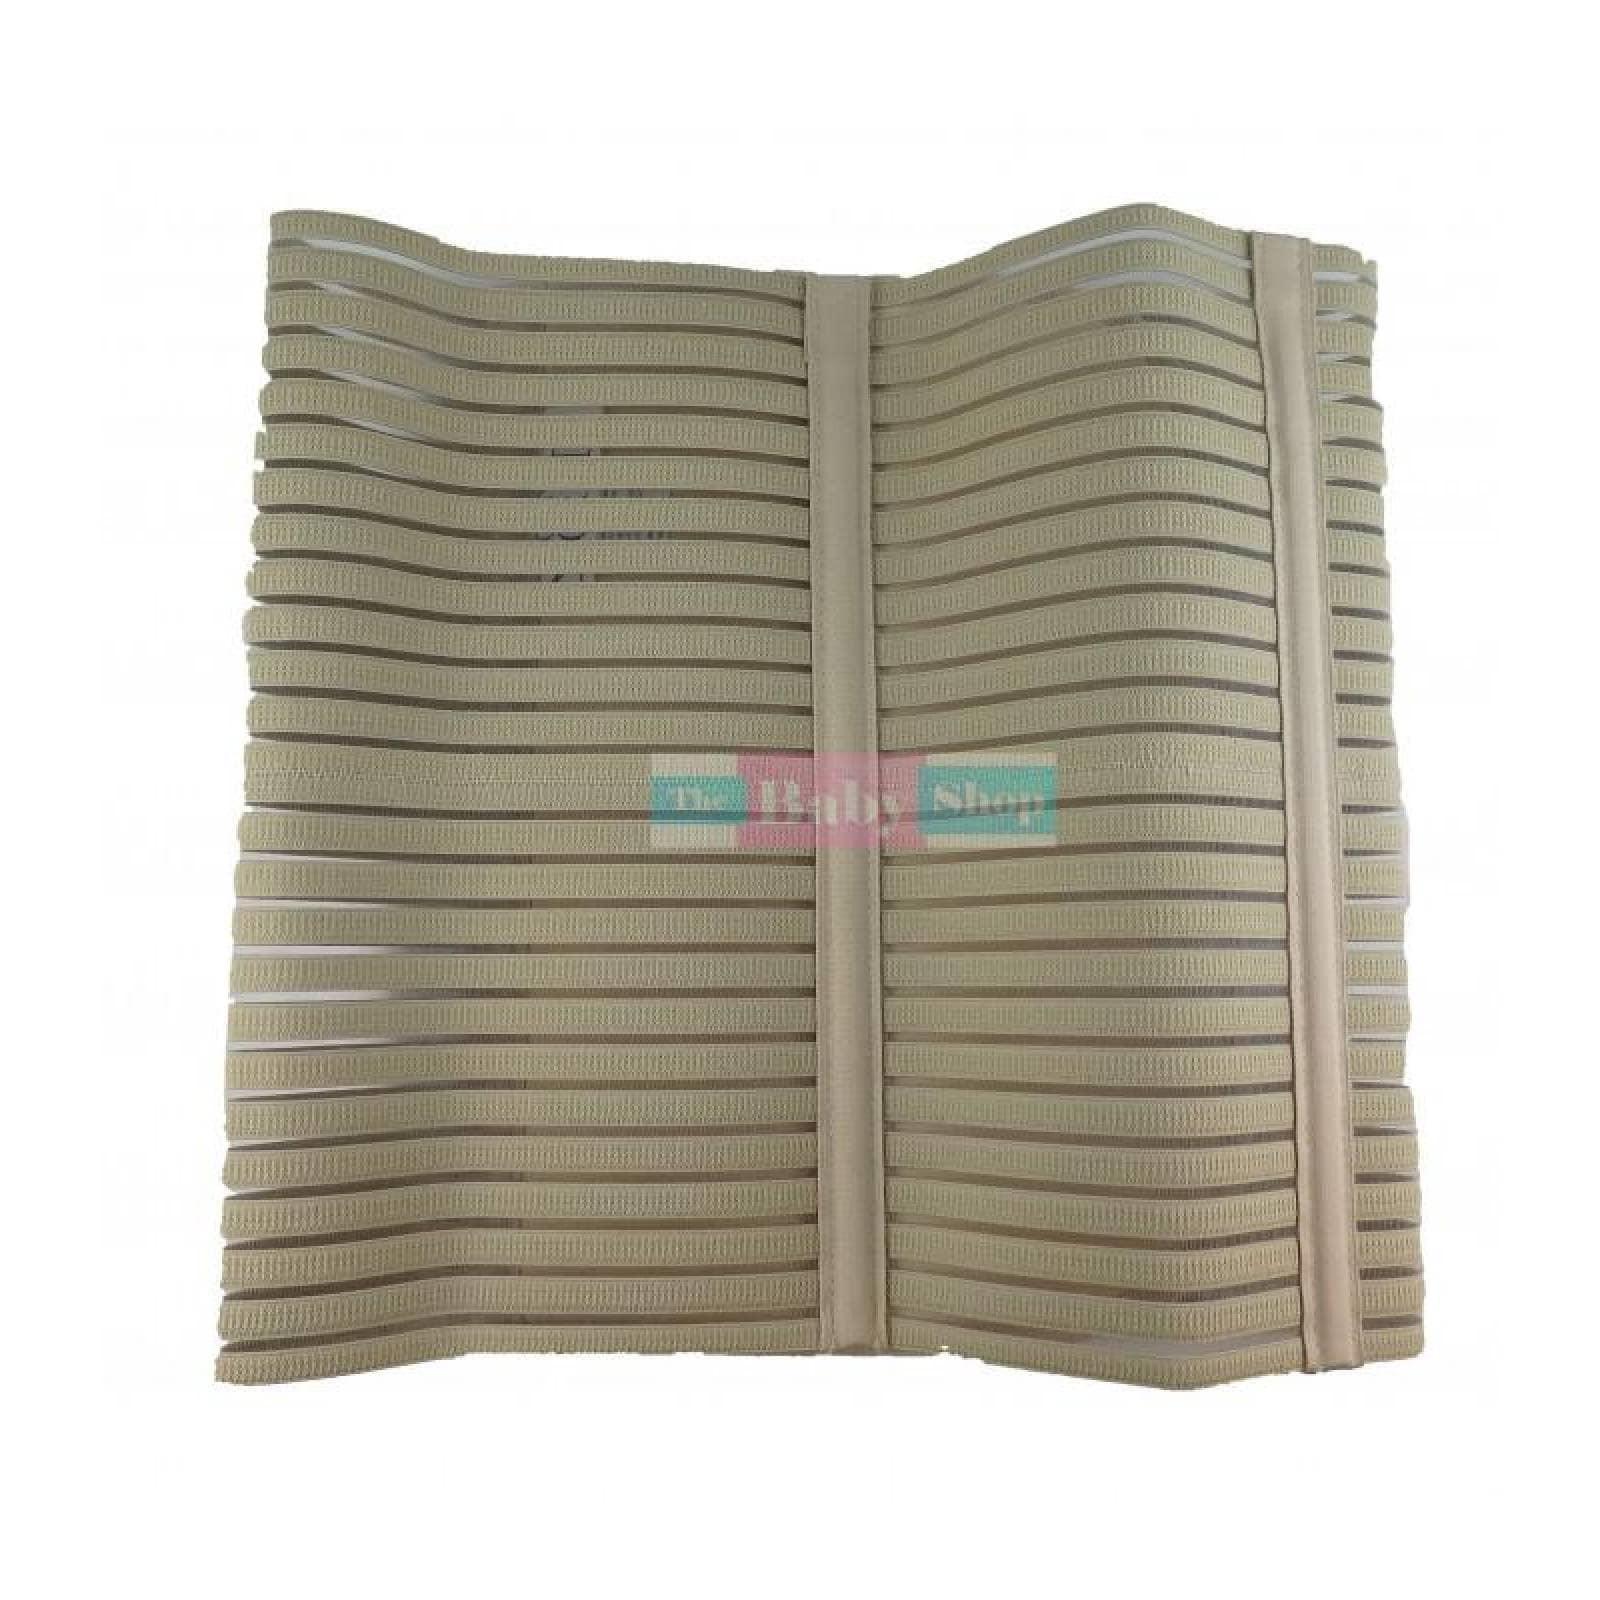 Cinturilla Post Operatorio Parto Transpirable Larga